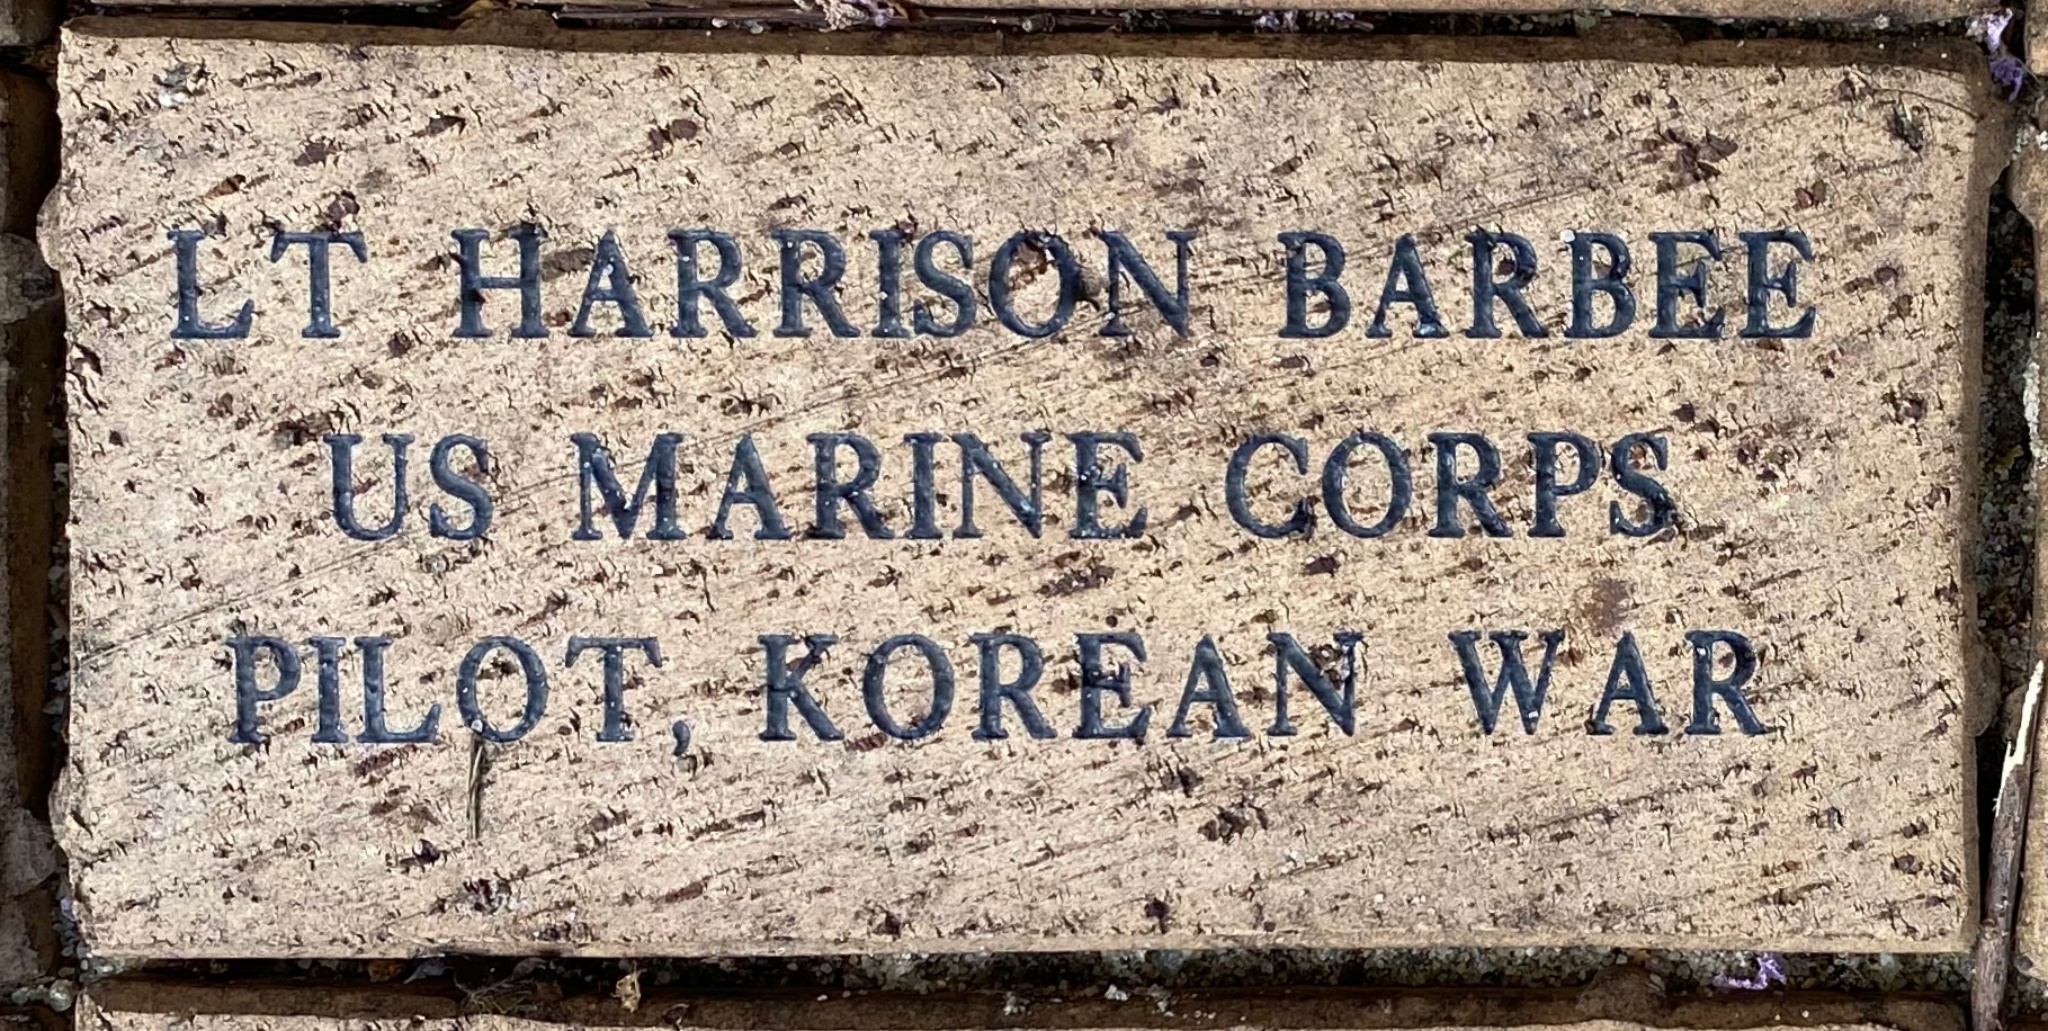 LT HARRISON BARBEE US MARINE CORPS PILOT, KOREAN WAR